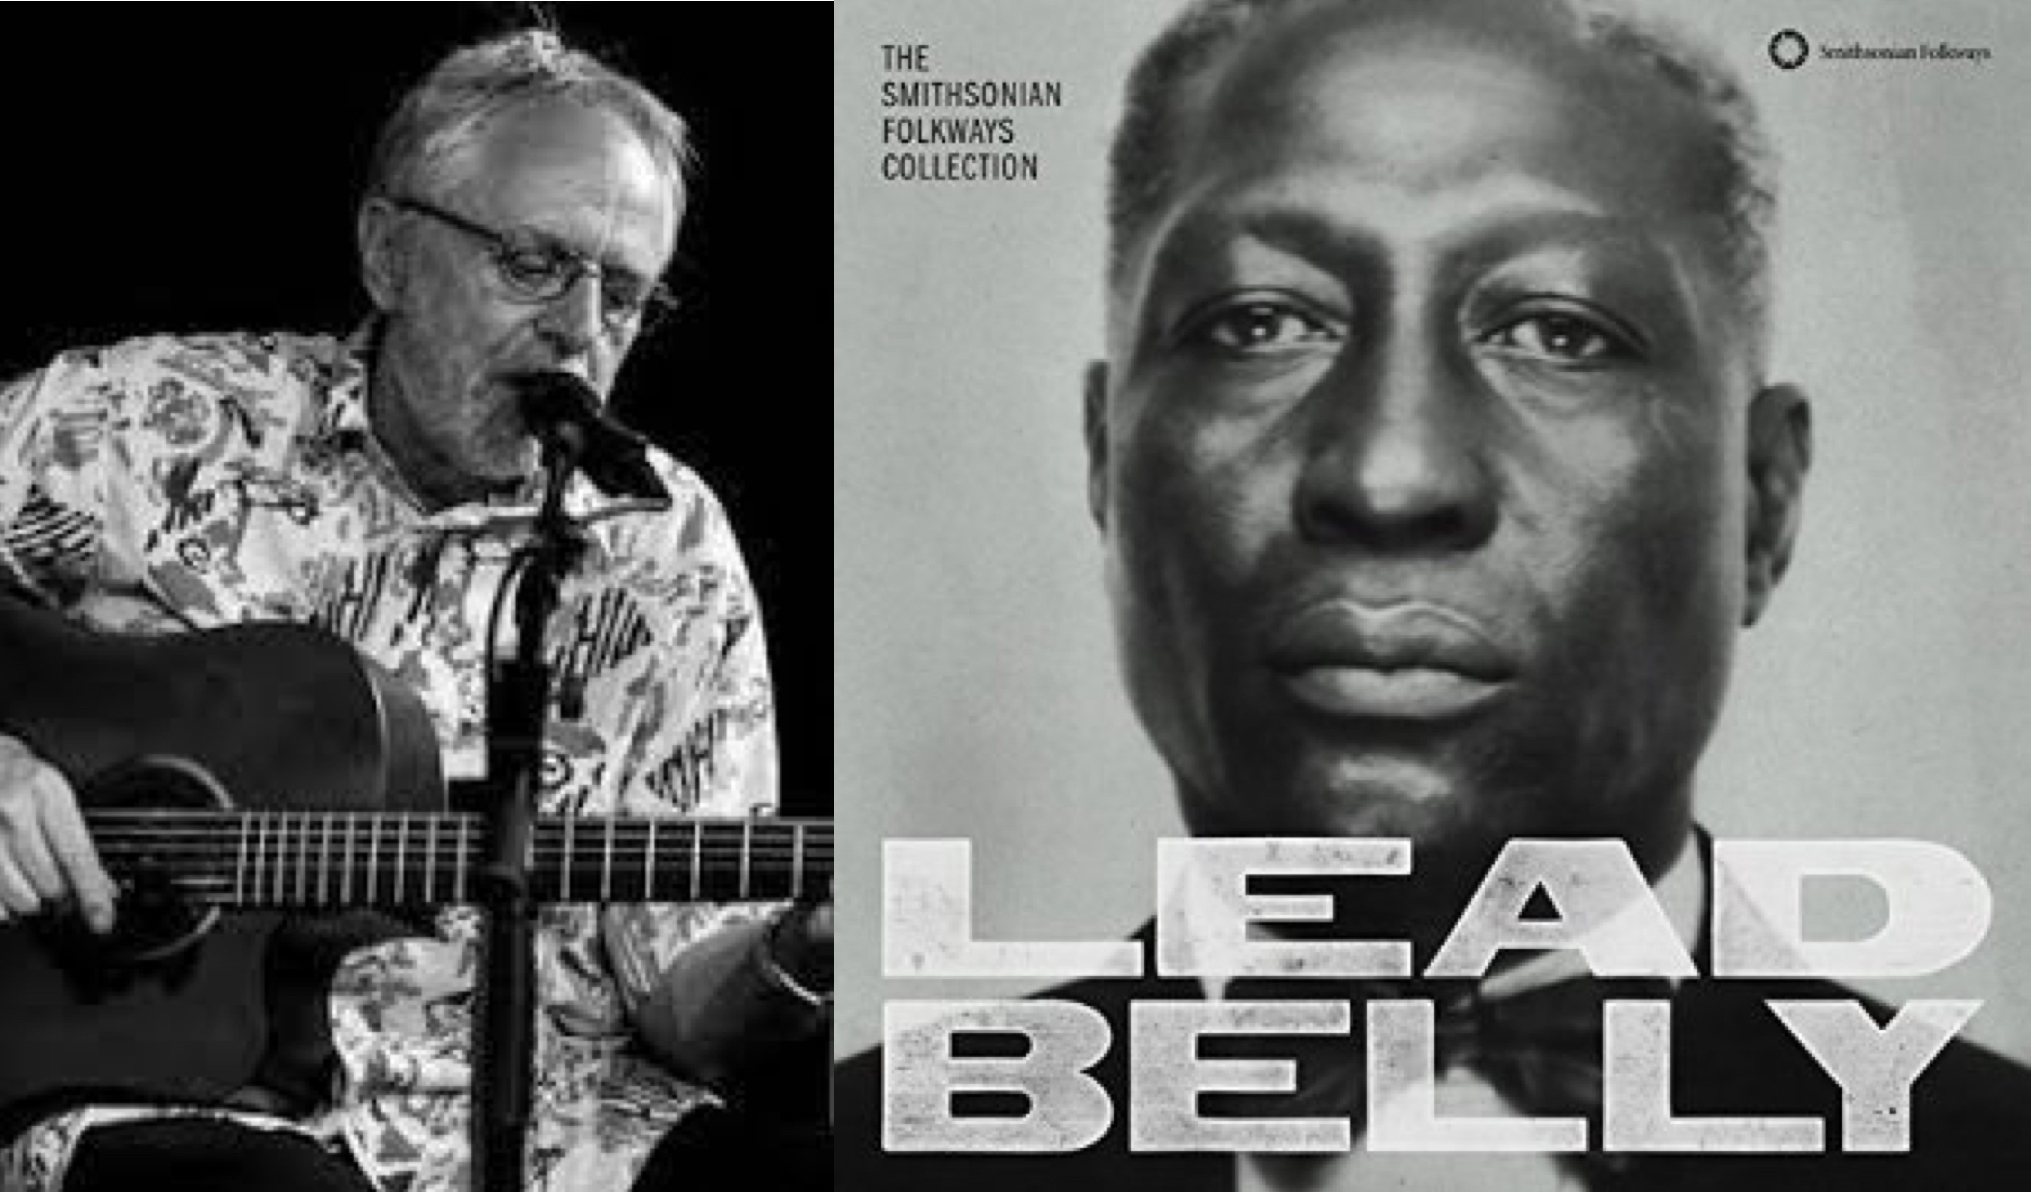 Musikalsk foredrag om Lead Belly